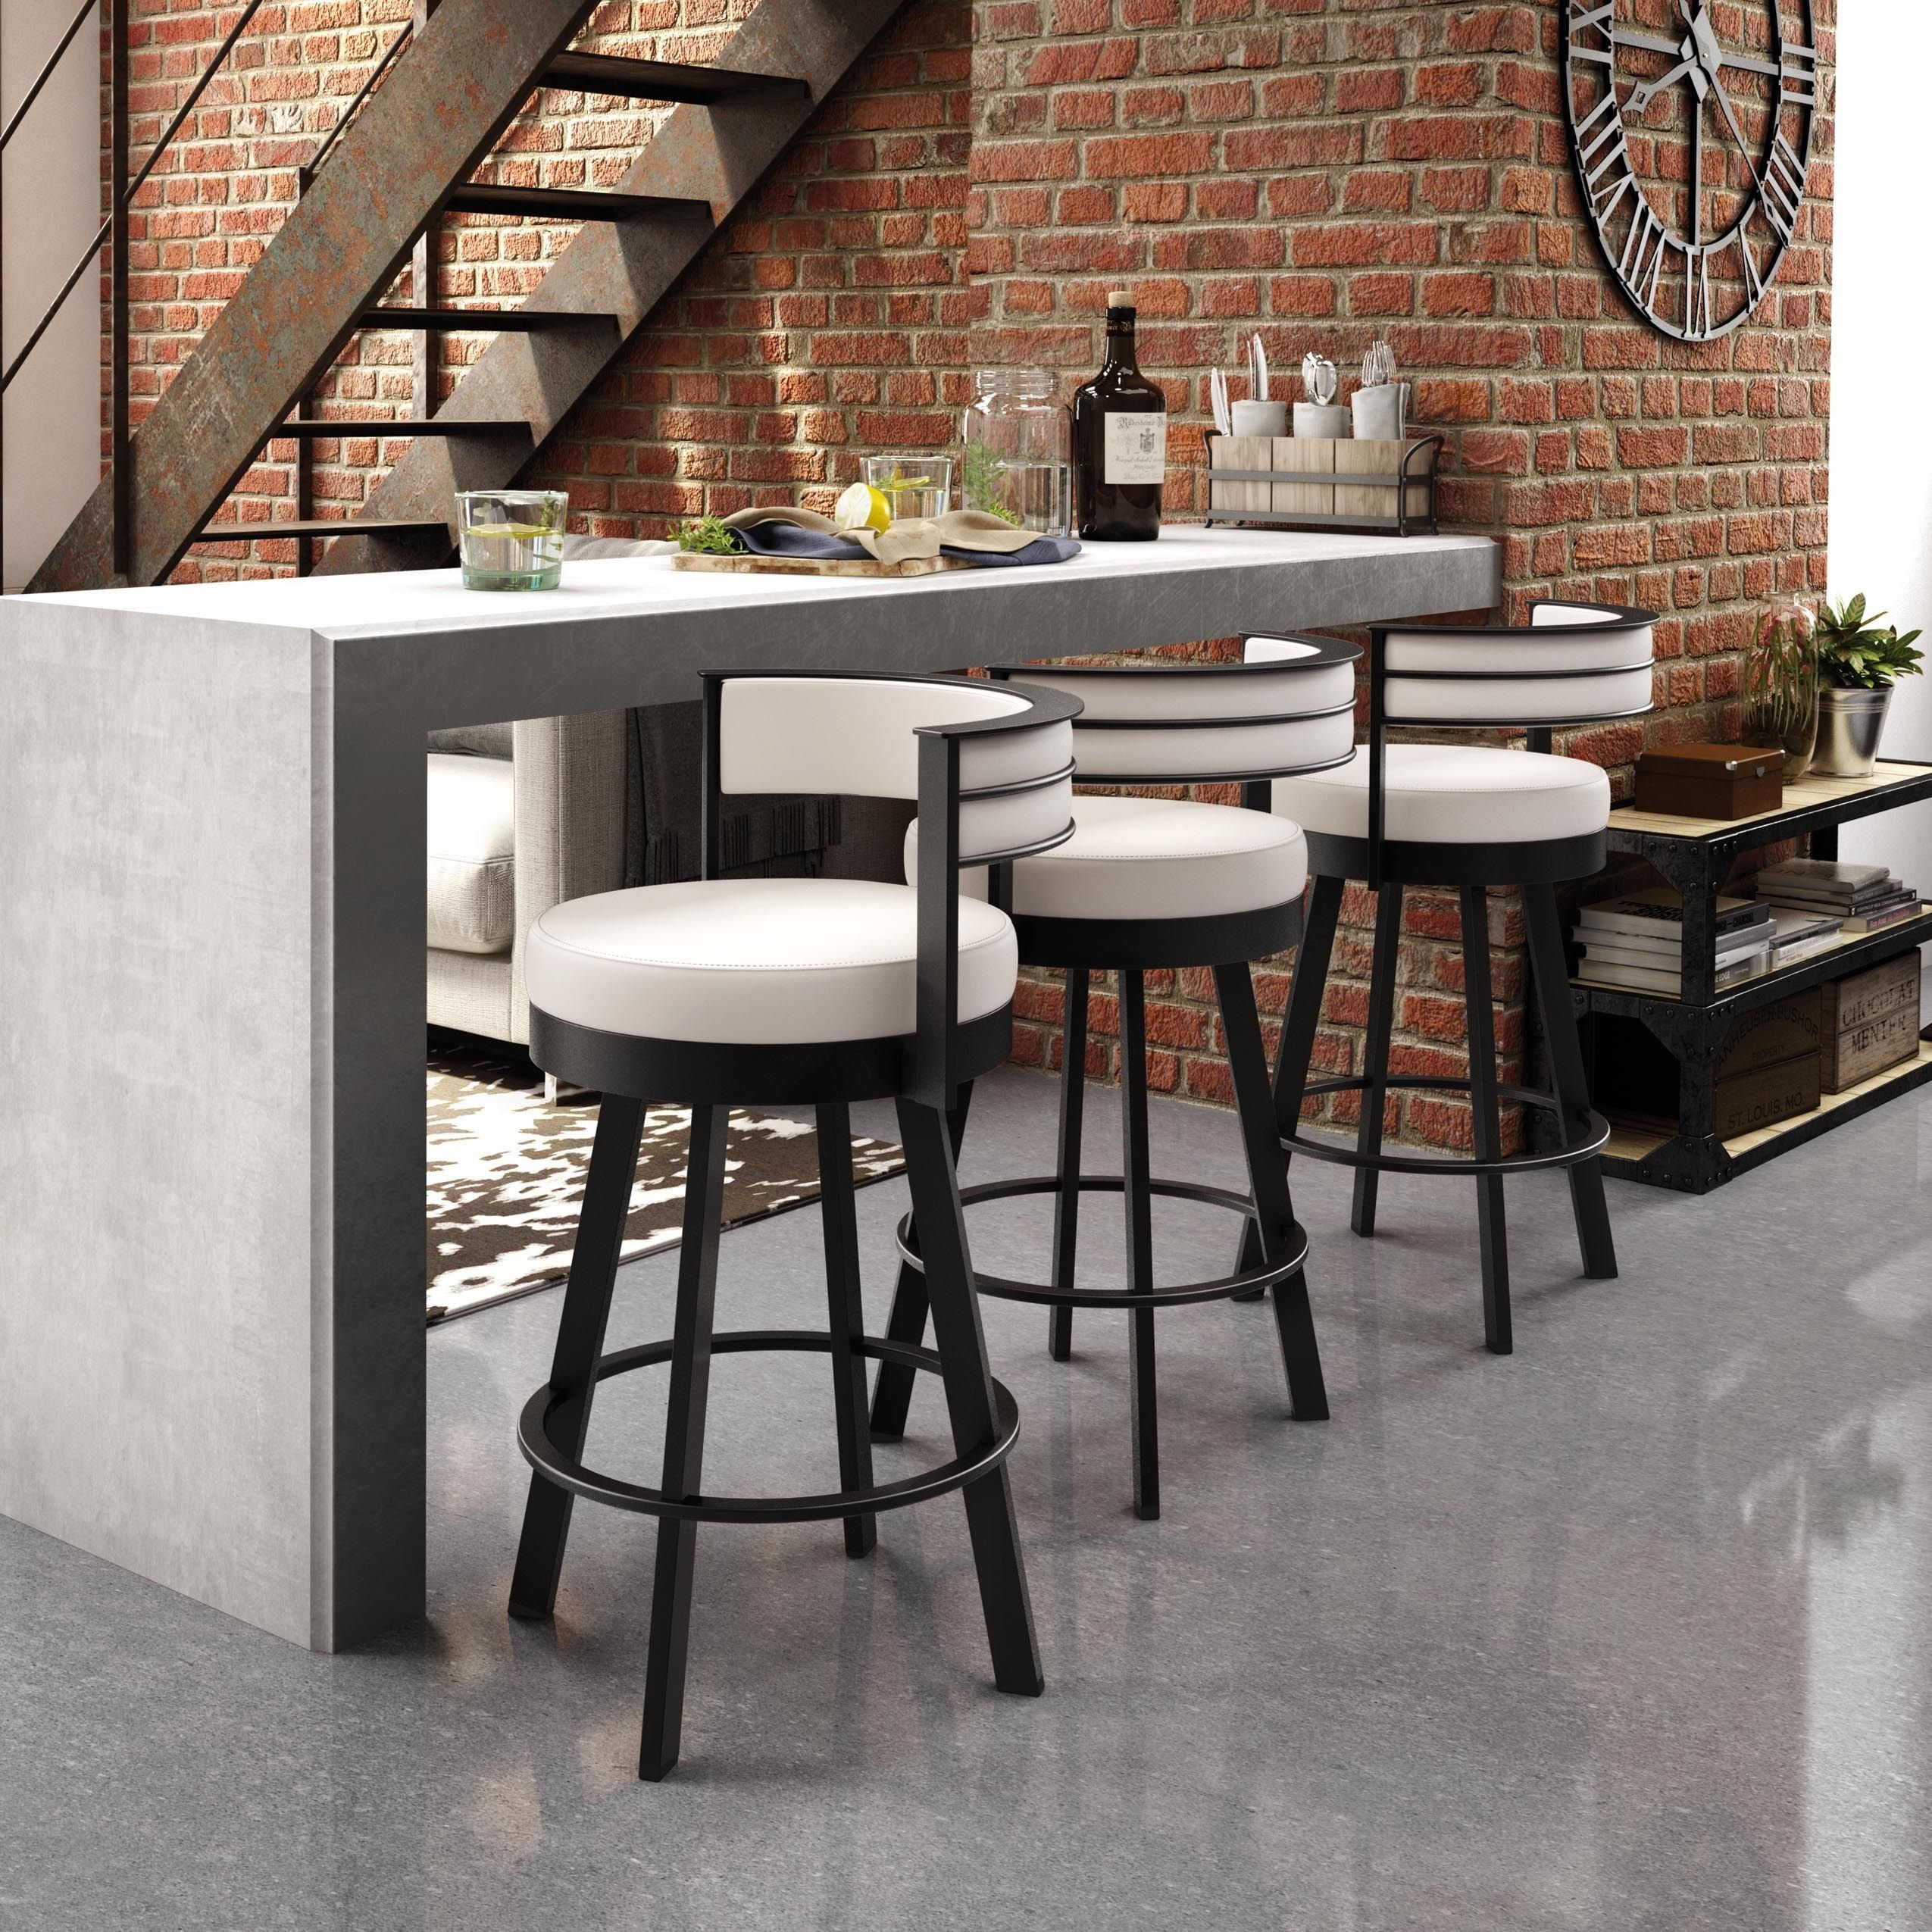 Clay alder home high bridge inch swivel metal counter stool